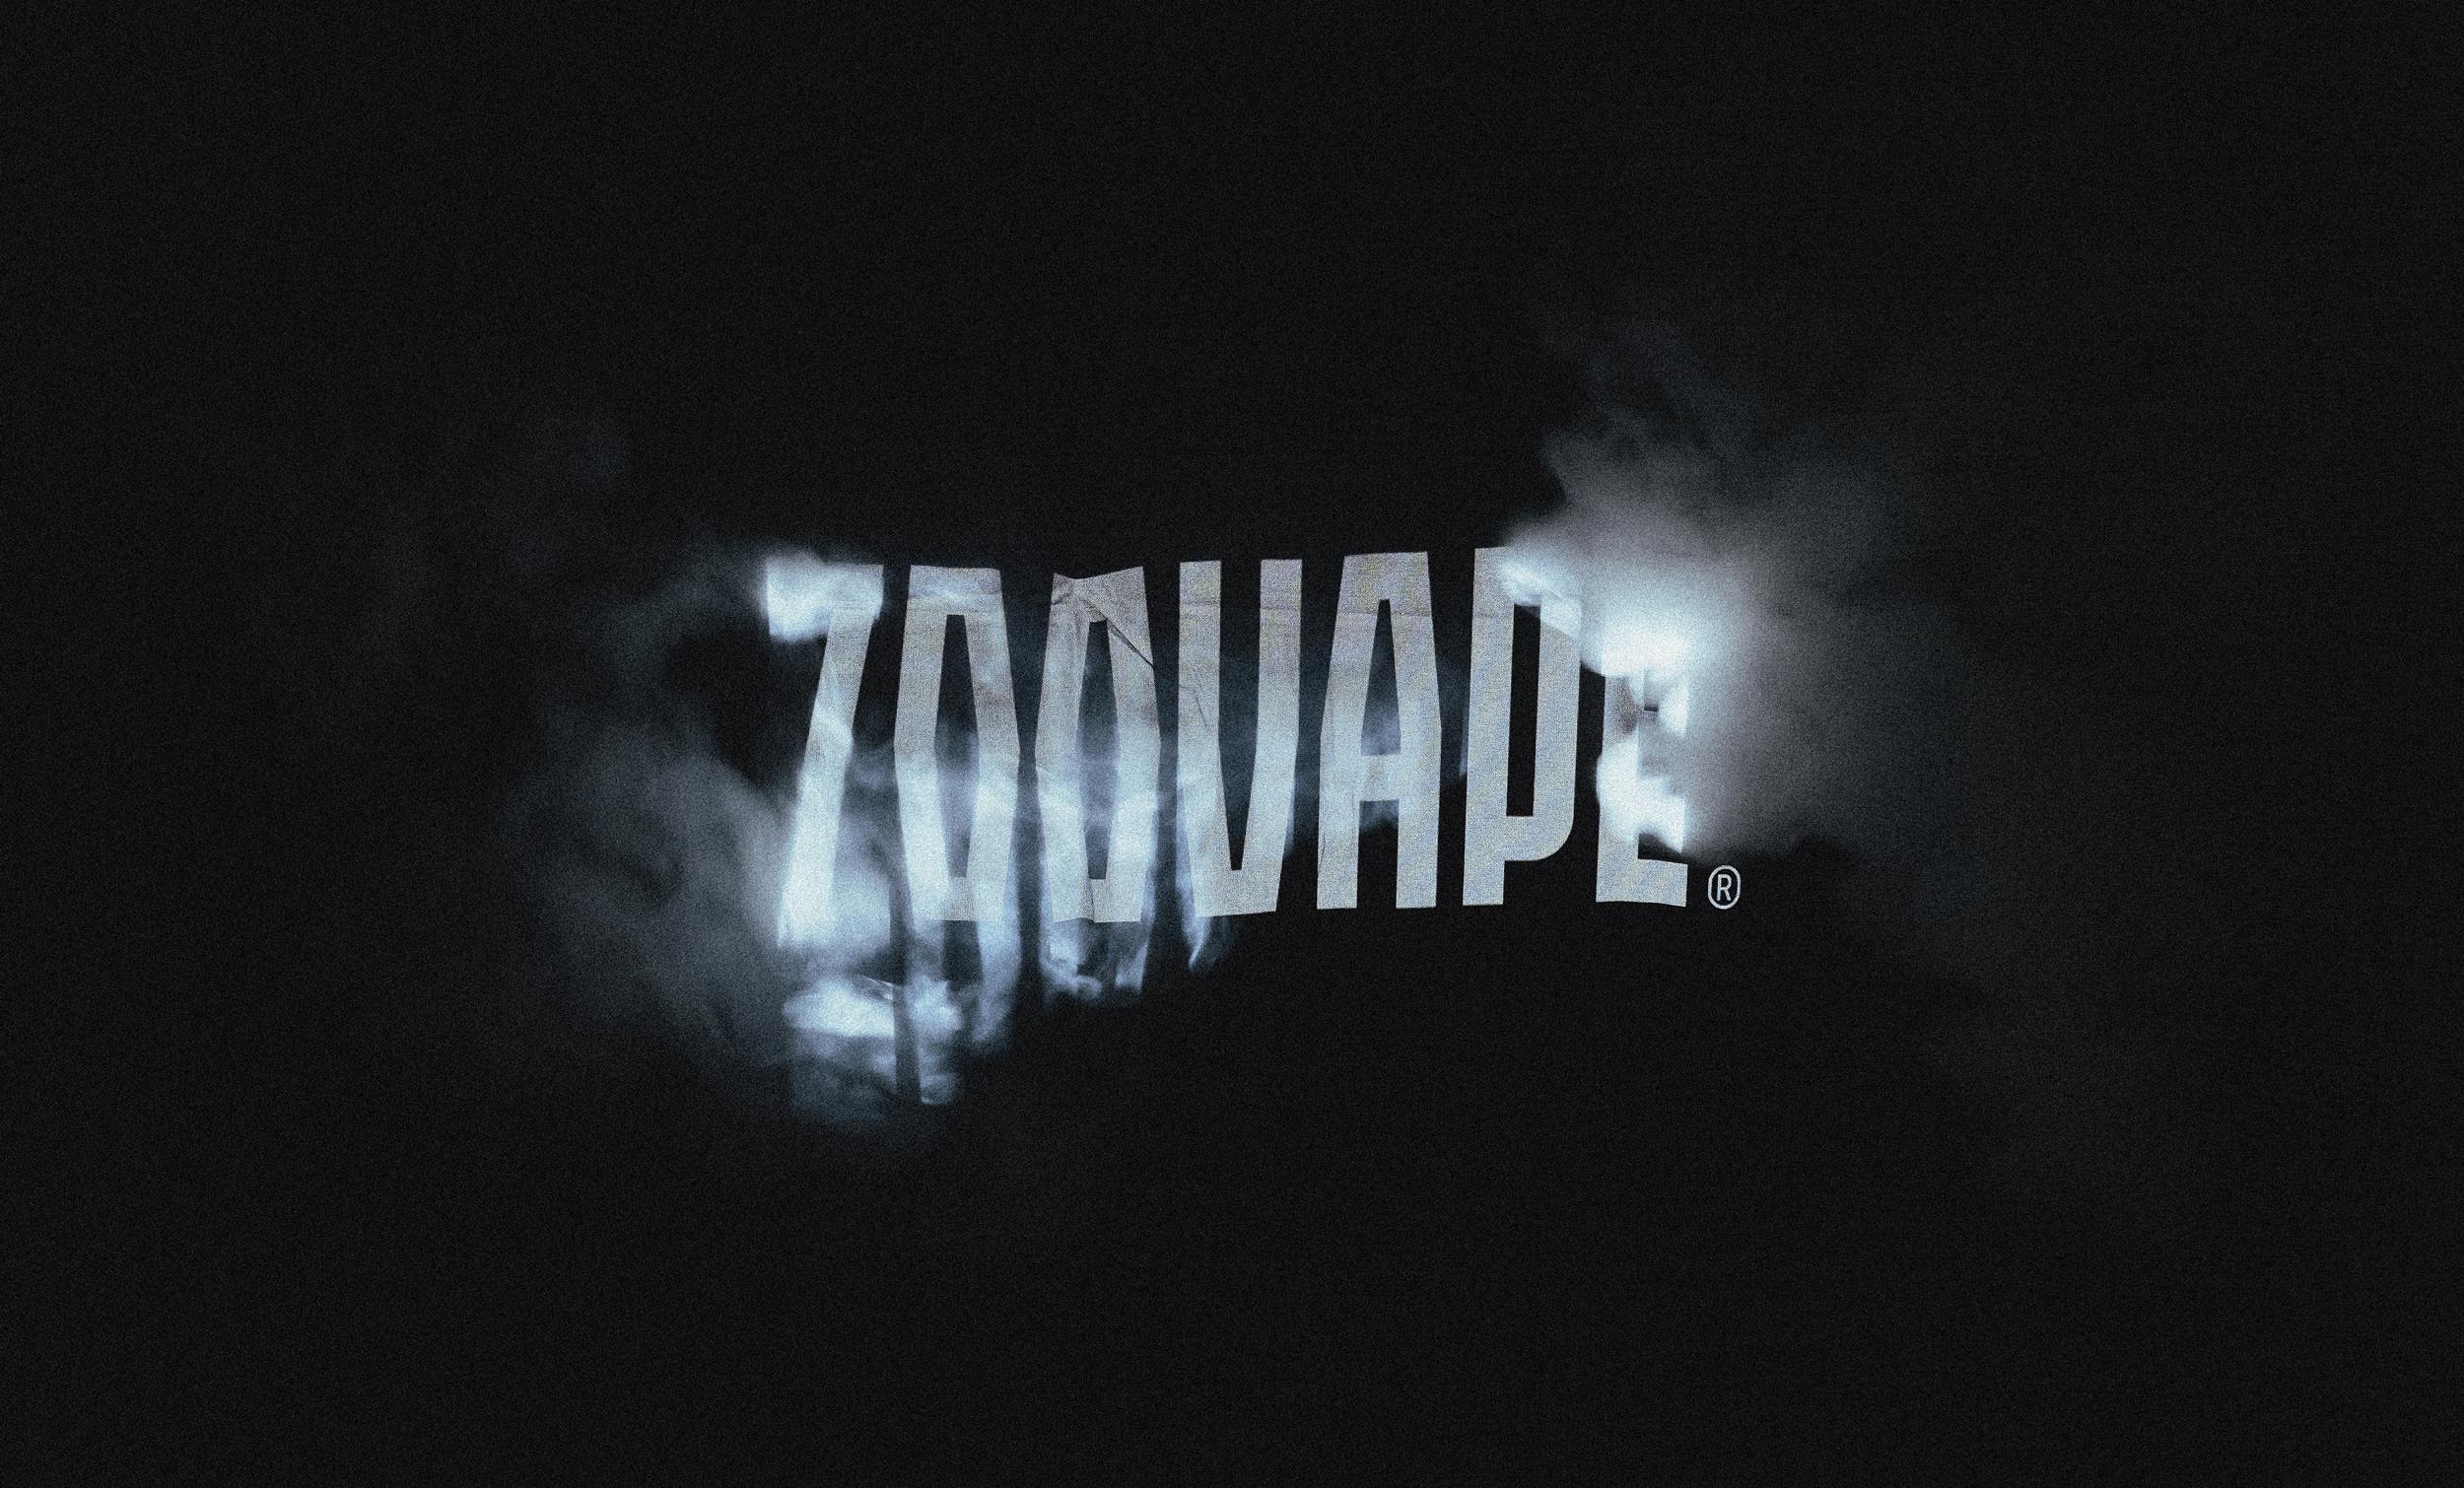 TUM_vegrande_zoovape_HD_11.jpg